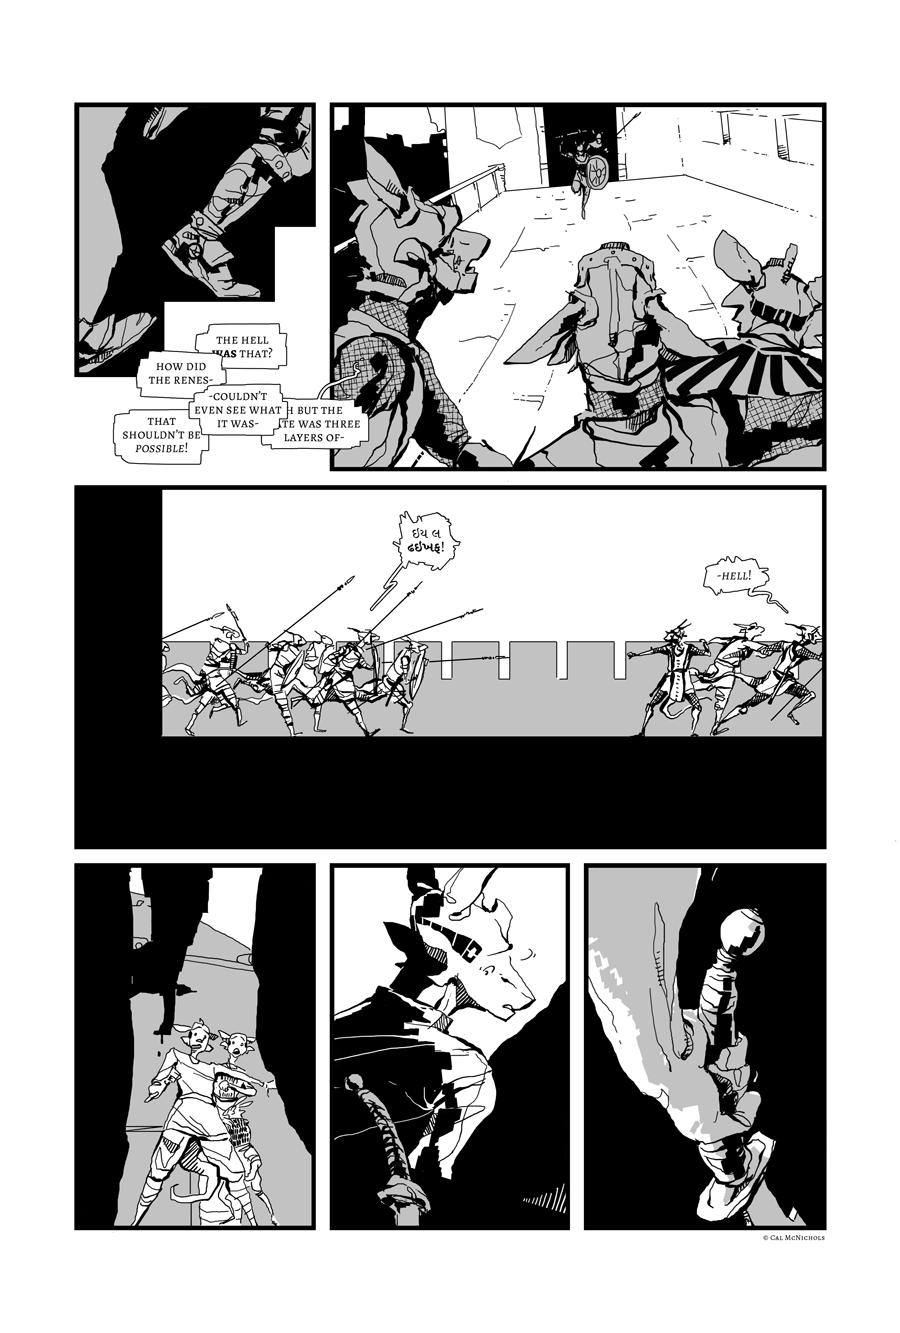 pg 33